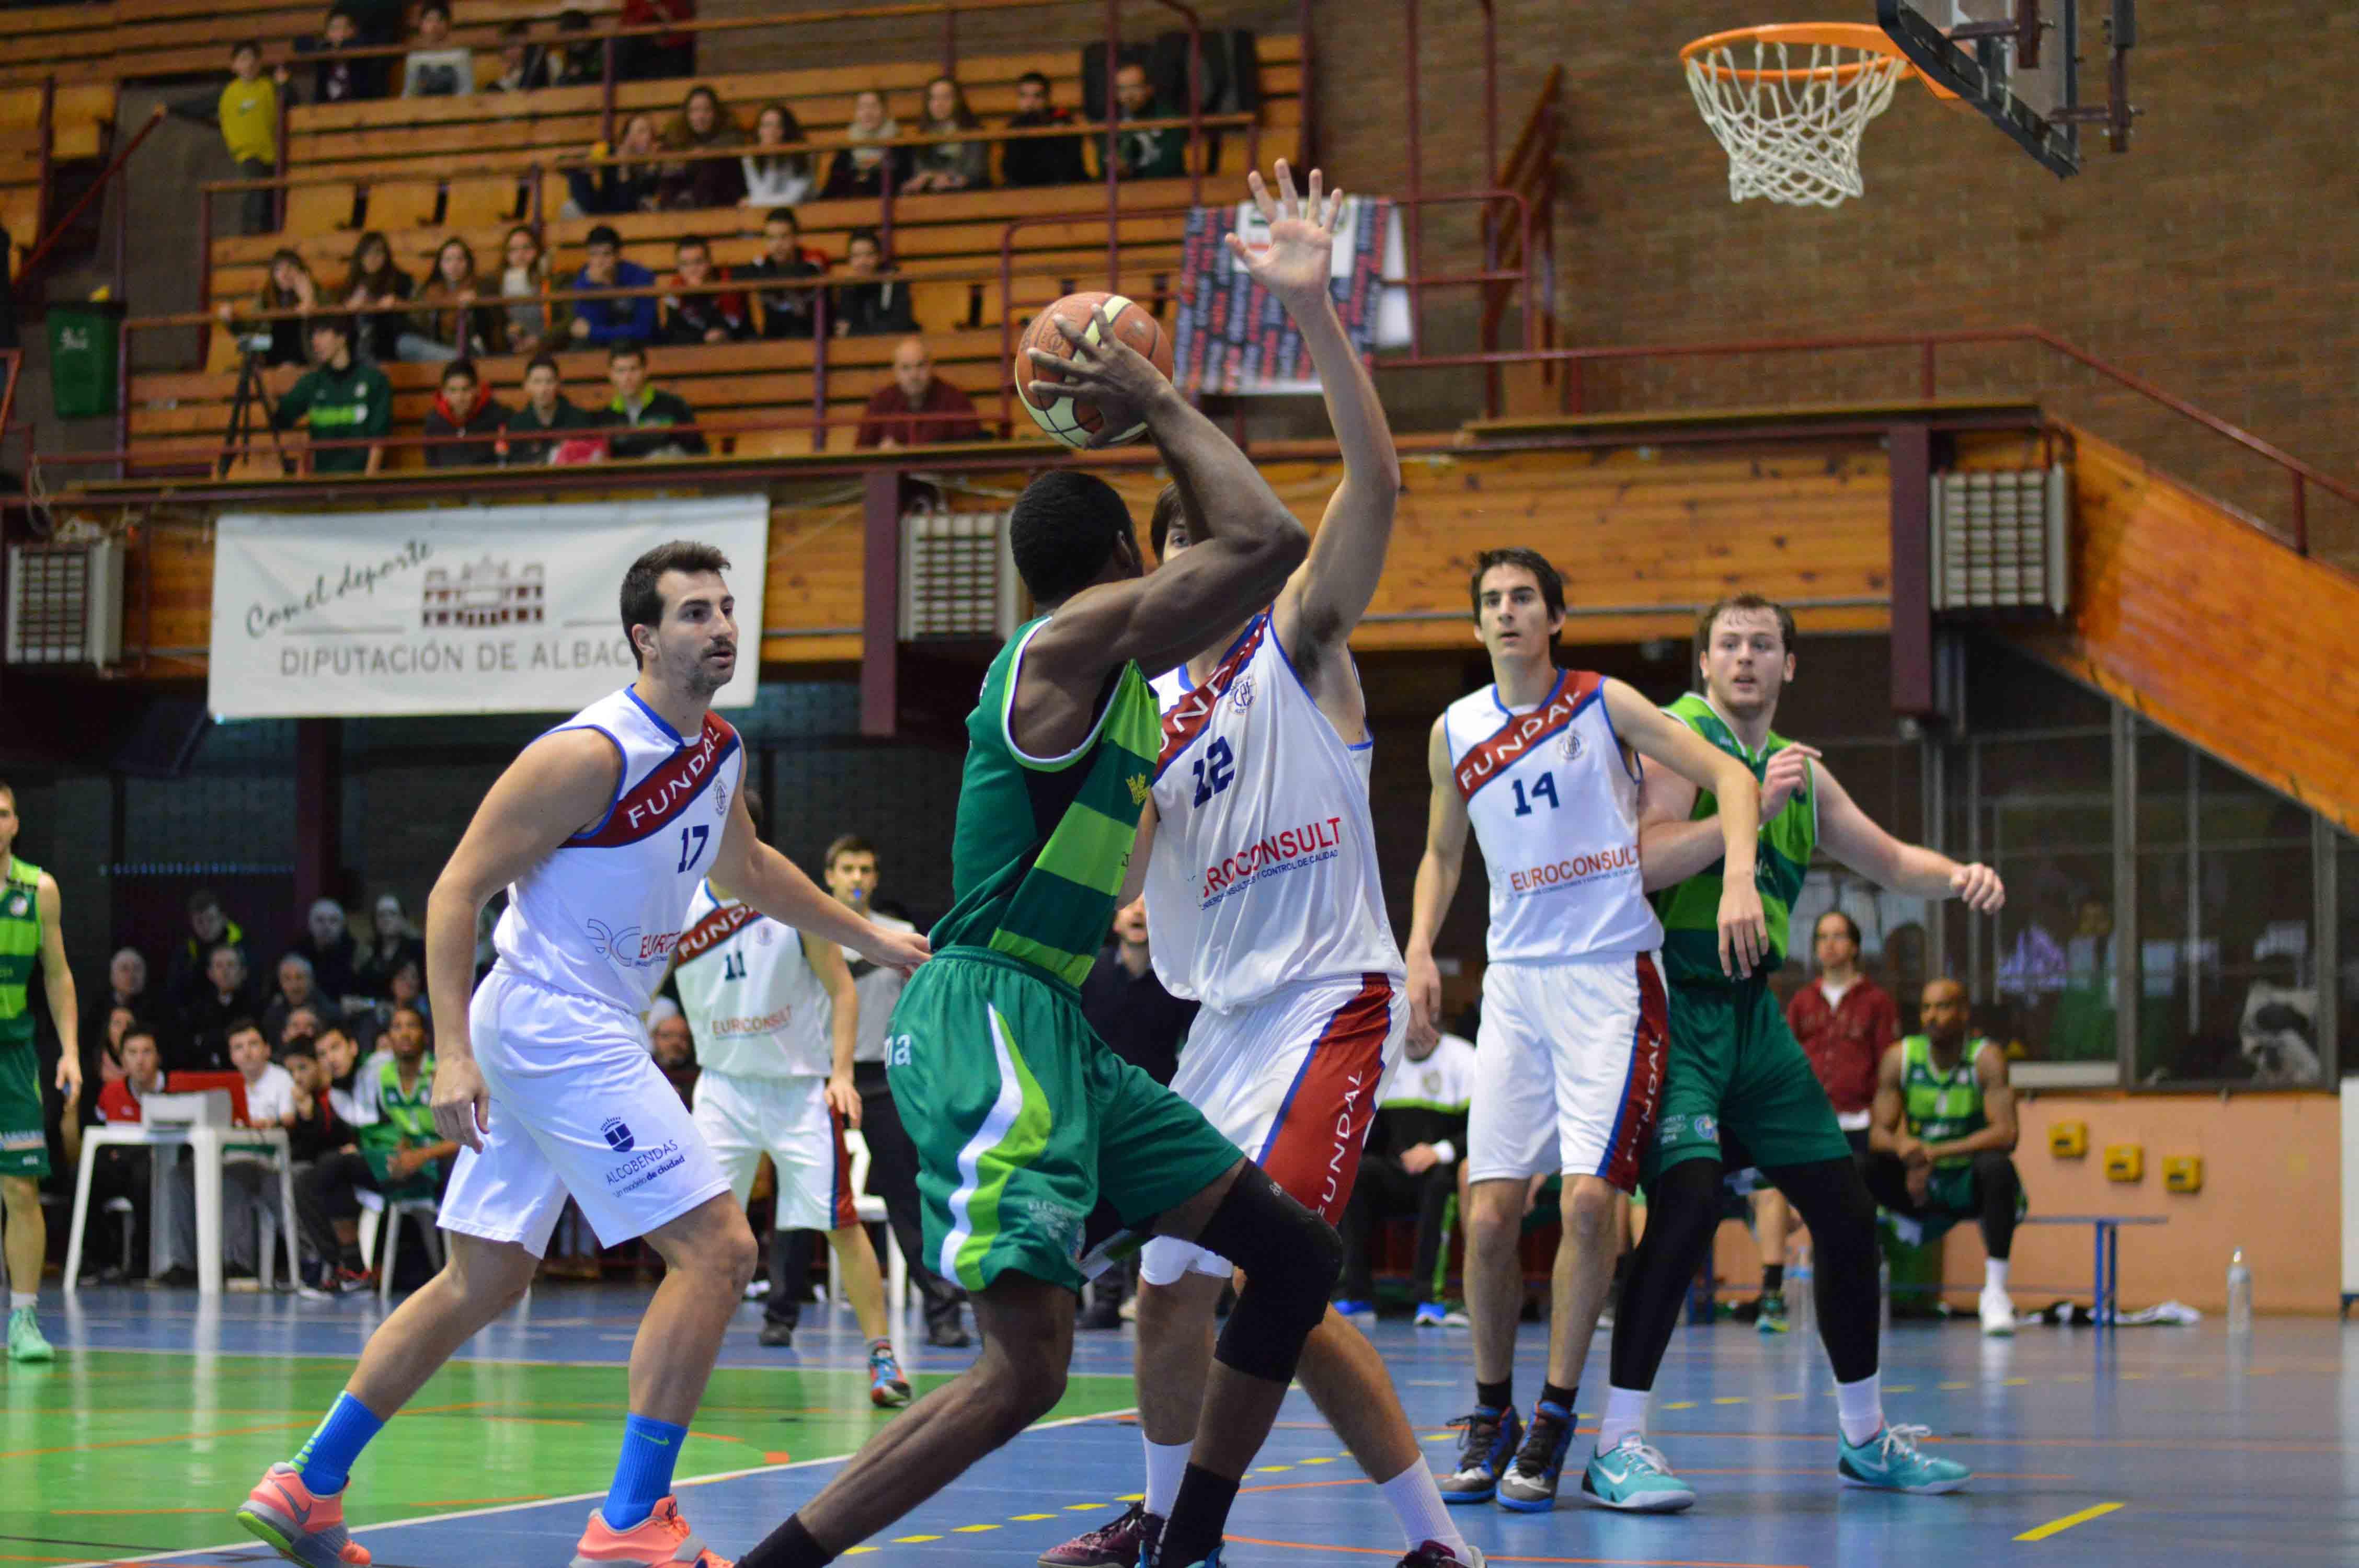 Albacete Basket - Euroconsult Alcobendas (Foto: Juan Luis Serrano)